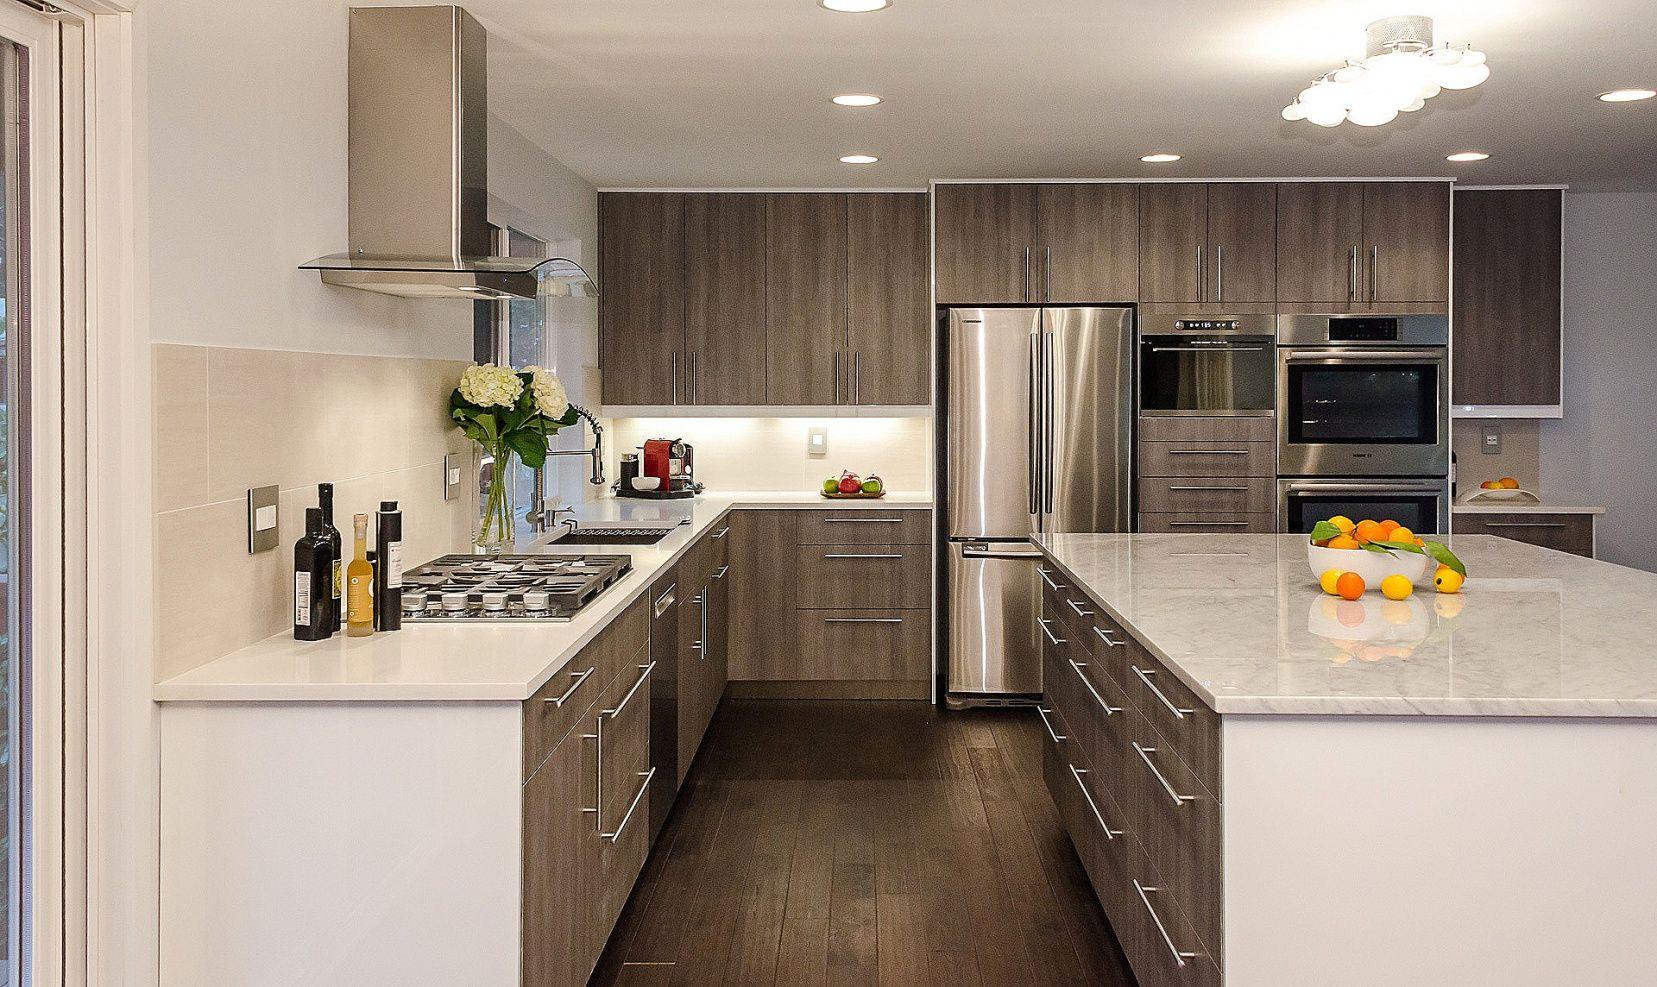 55+ Quartz Countertops Costco - Remodeling Ideas for Kitchens Check ...